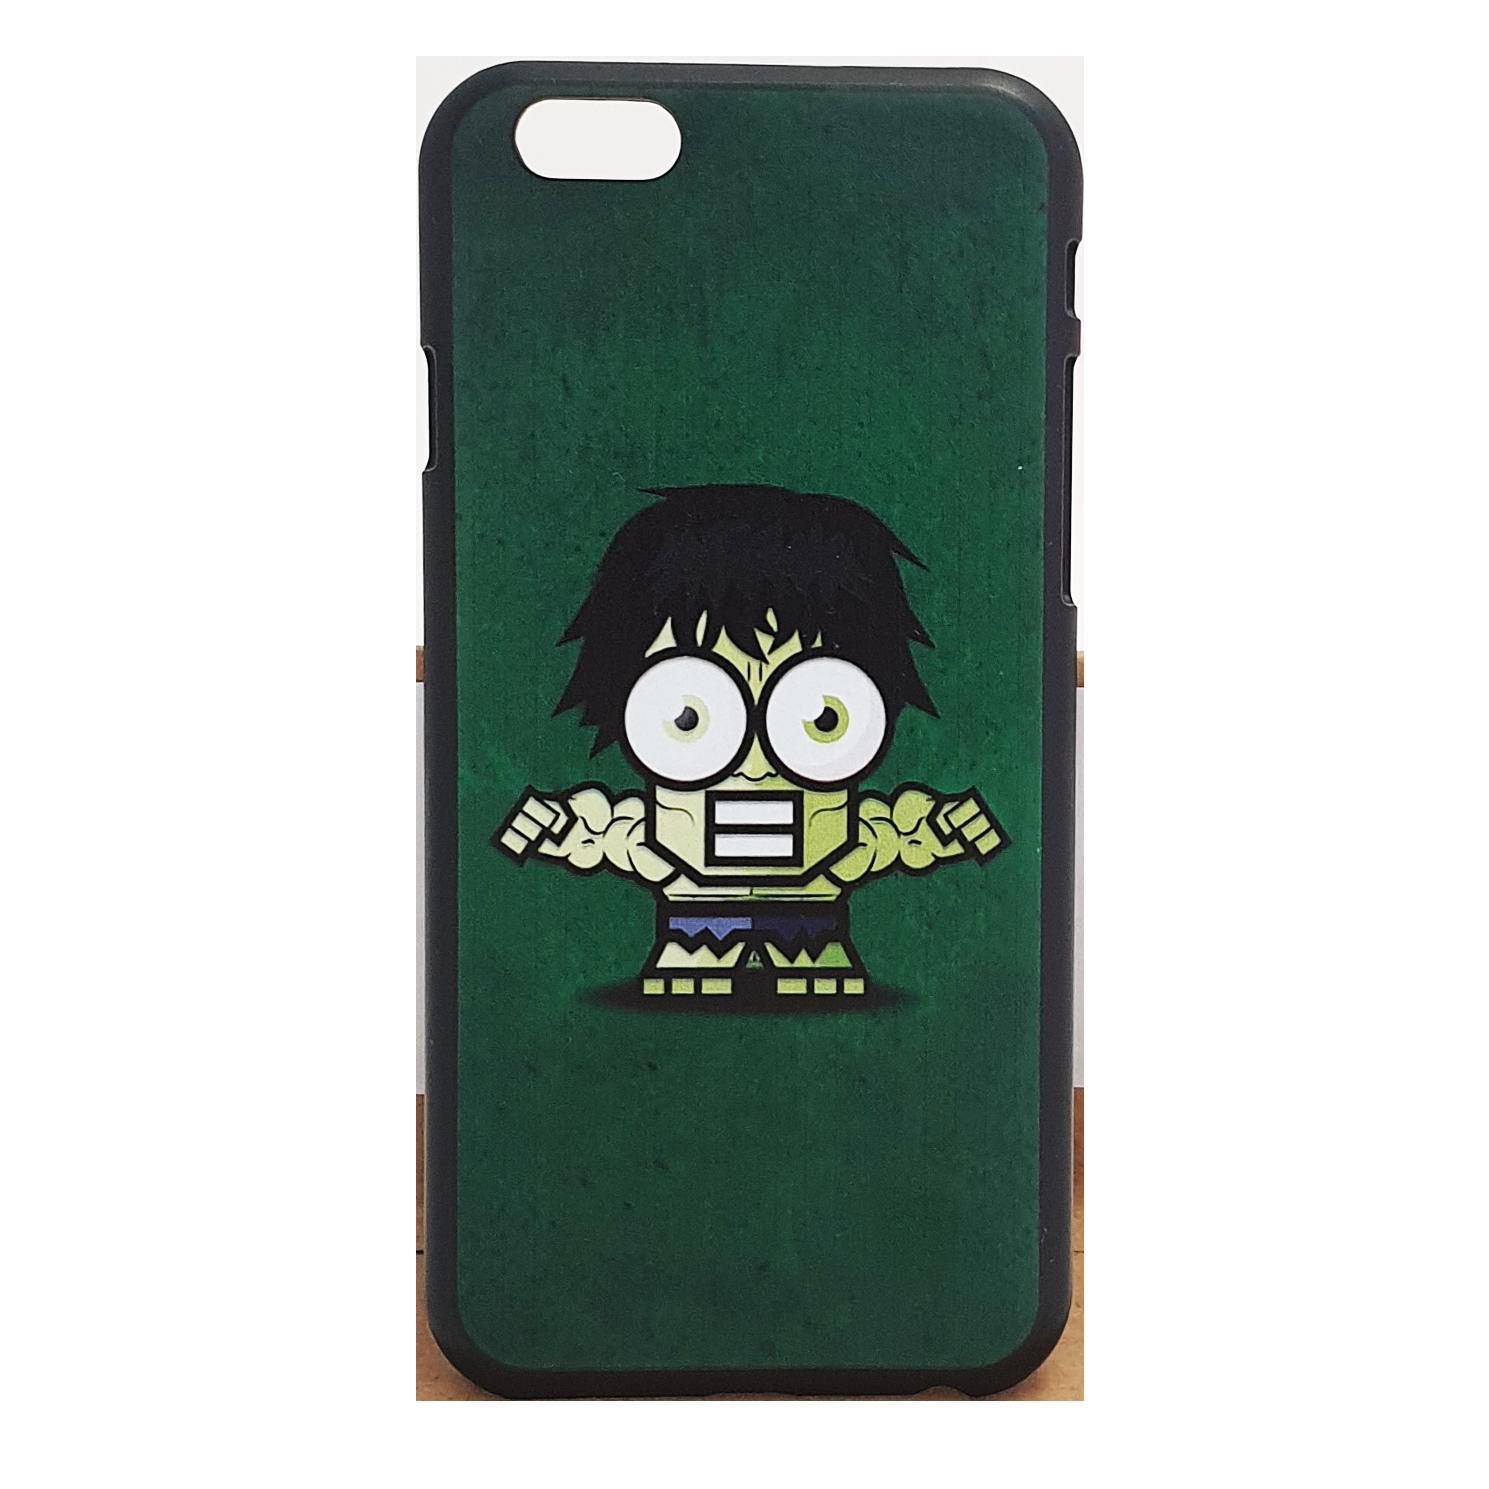 Mobilskal iPhone 6 / 6S Hulk